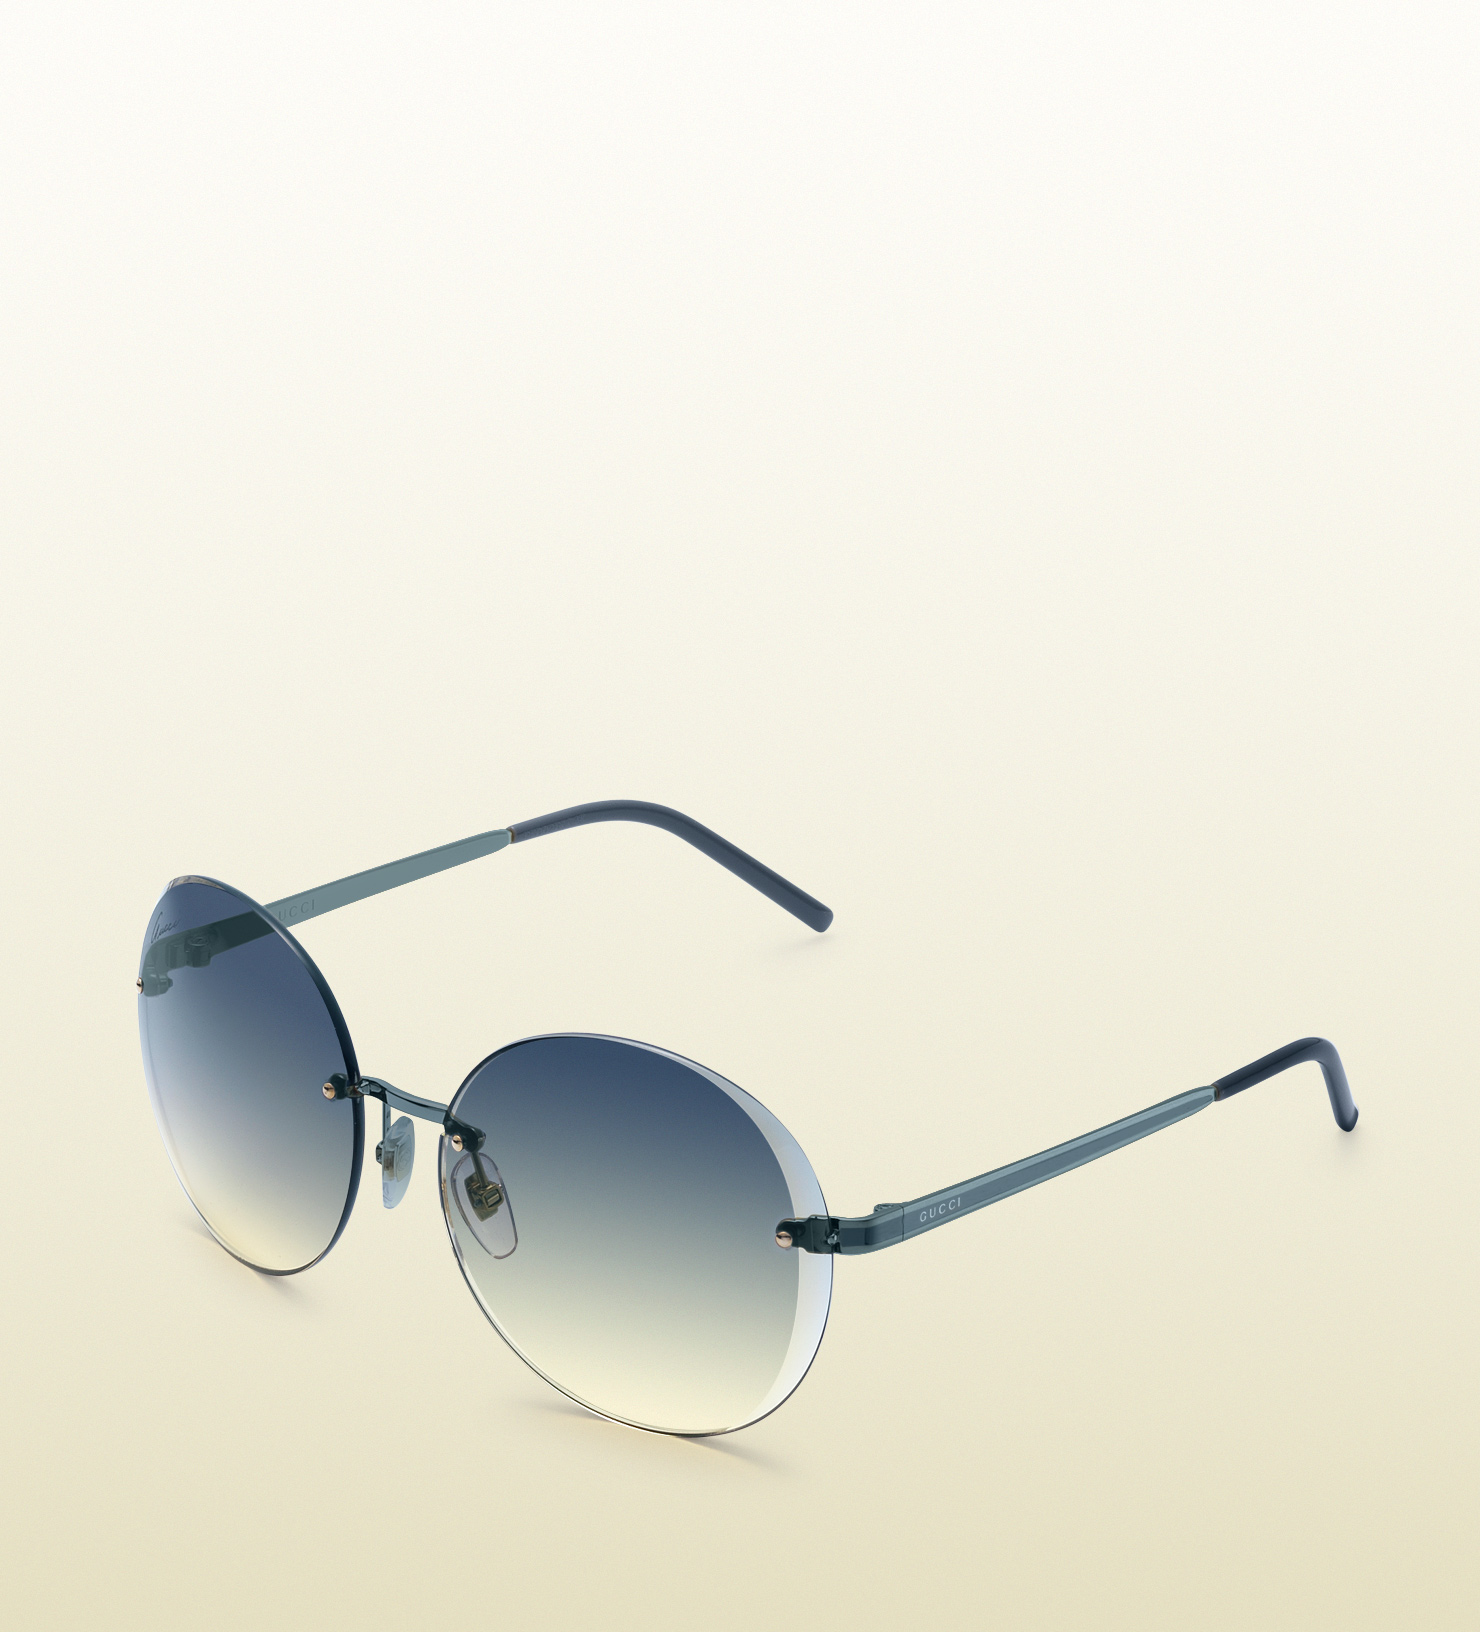 8c8aff3ca7 Lyst - Gucci Flora Round Rimless Sunglasses in Blue for Men